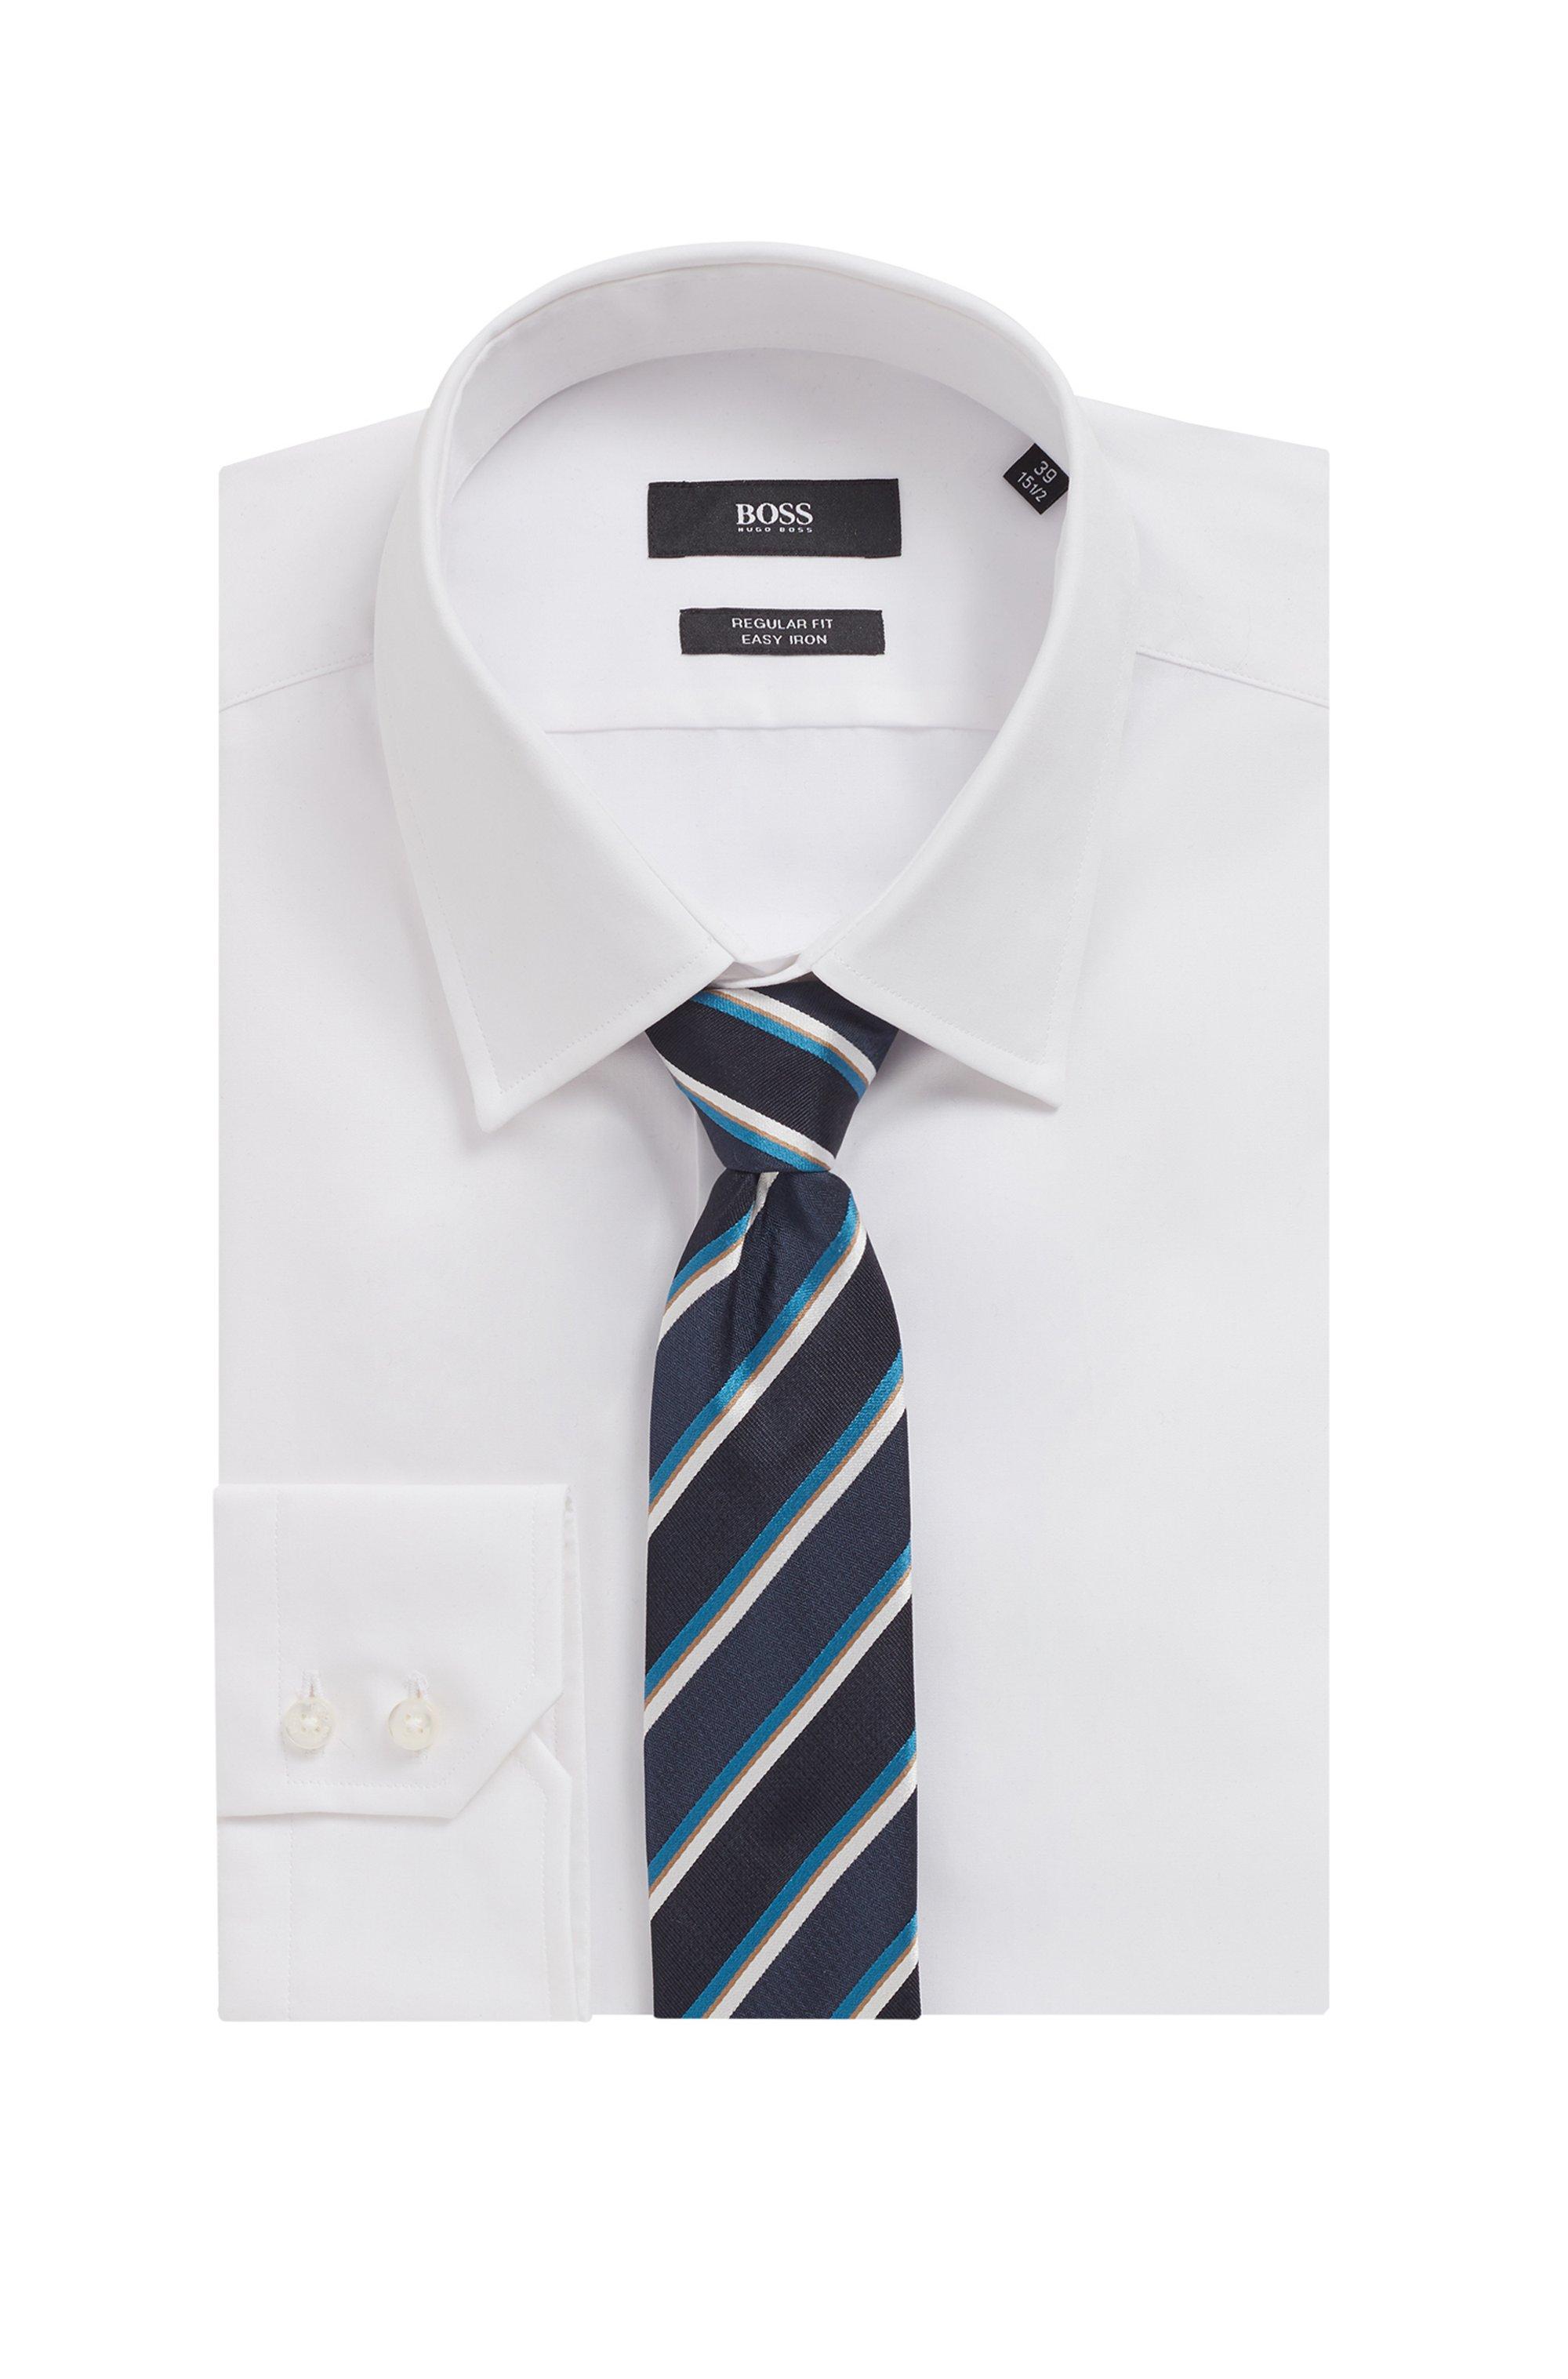 Diagonally striped tie in Italian silk jacquard